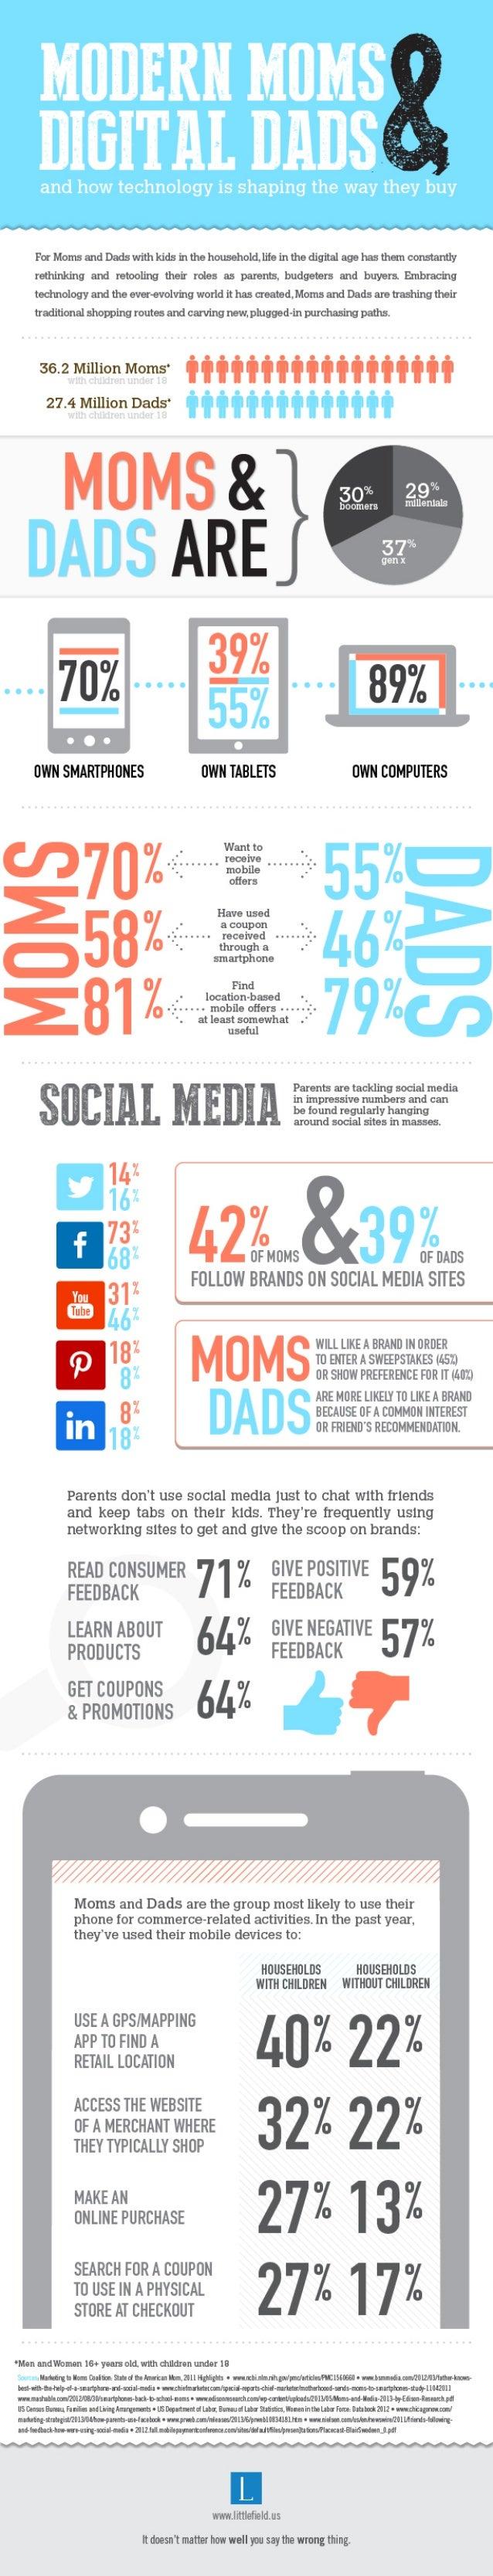 Modern Moms and Digital Dads